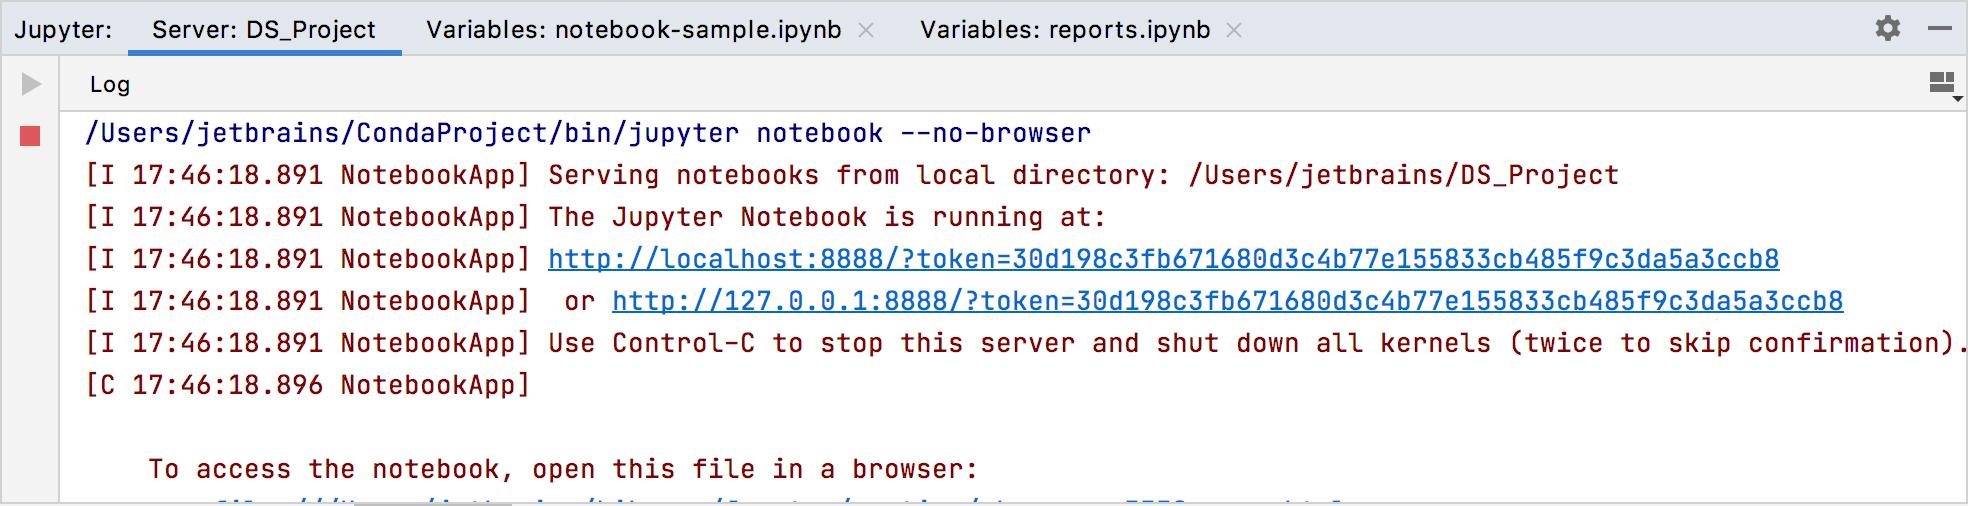 Jupyter server tool window: the Server log tab